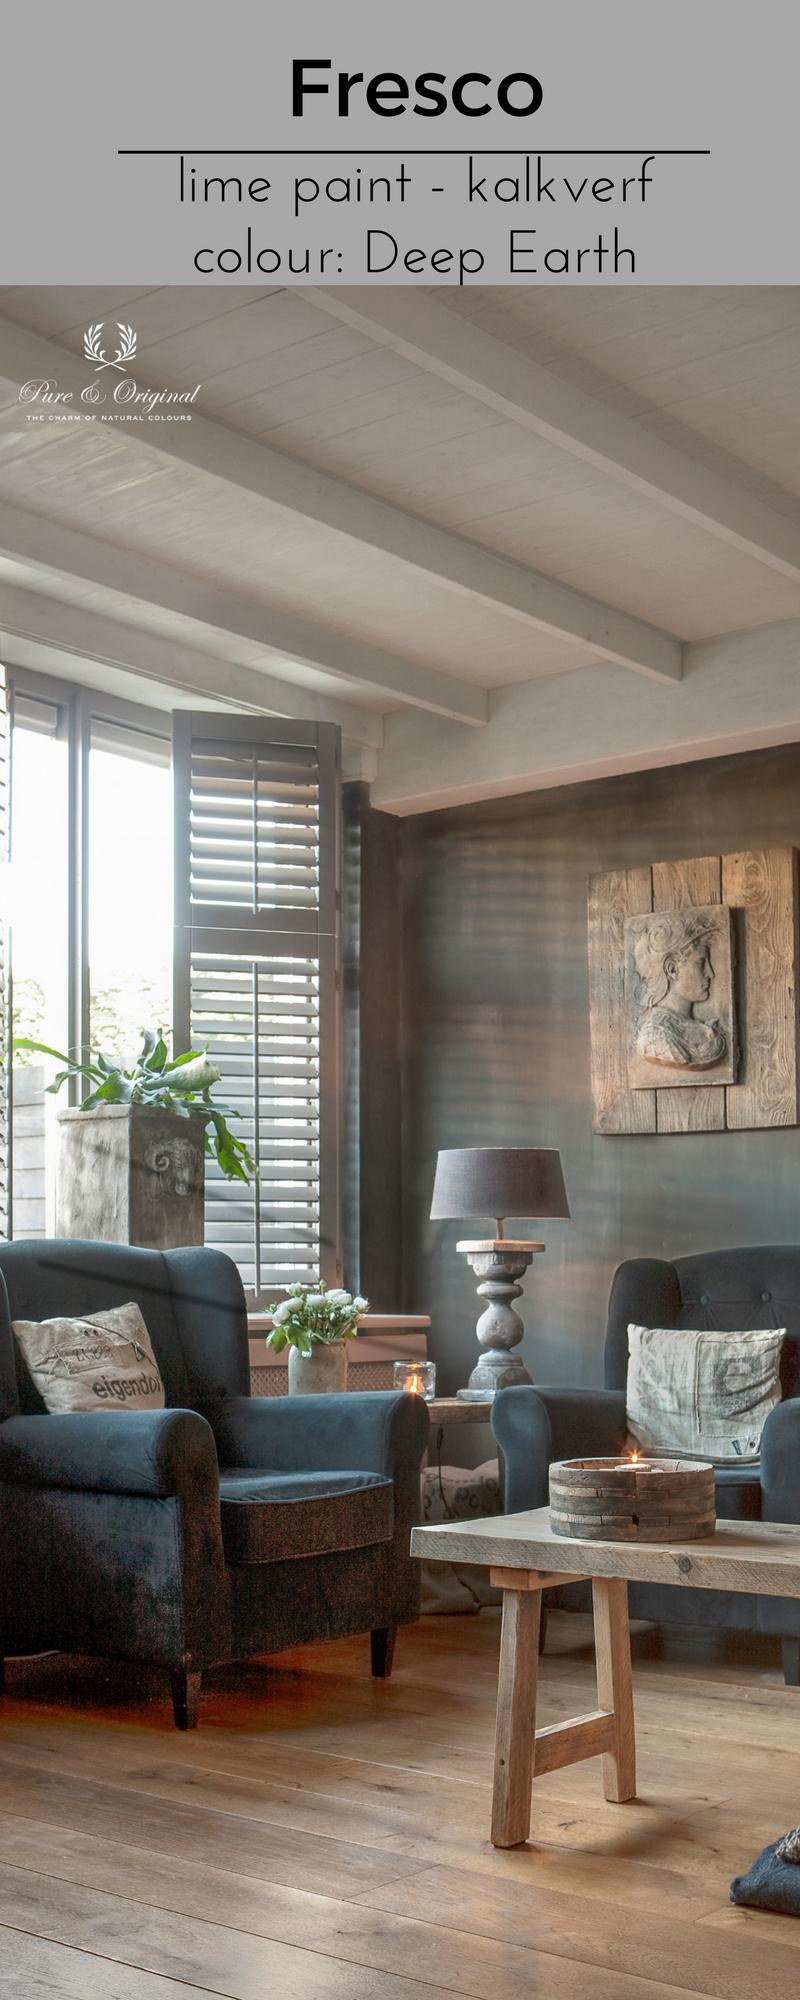 The official website of interieur pinterest for Wohnzimmer wandfarbe ideen